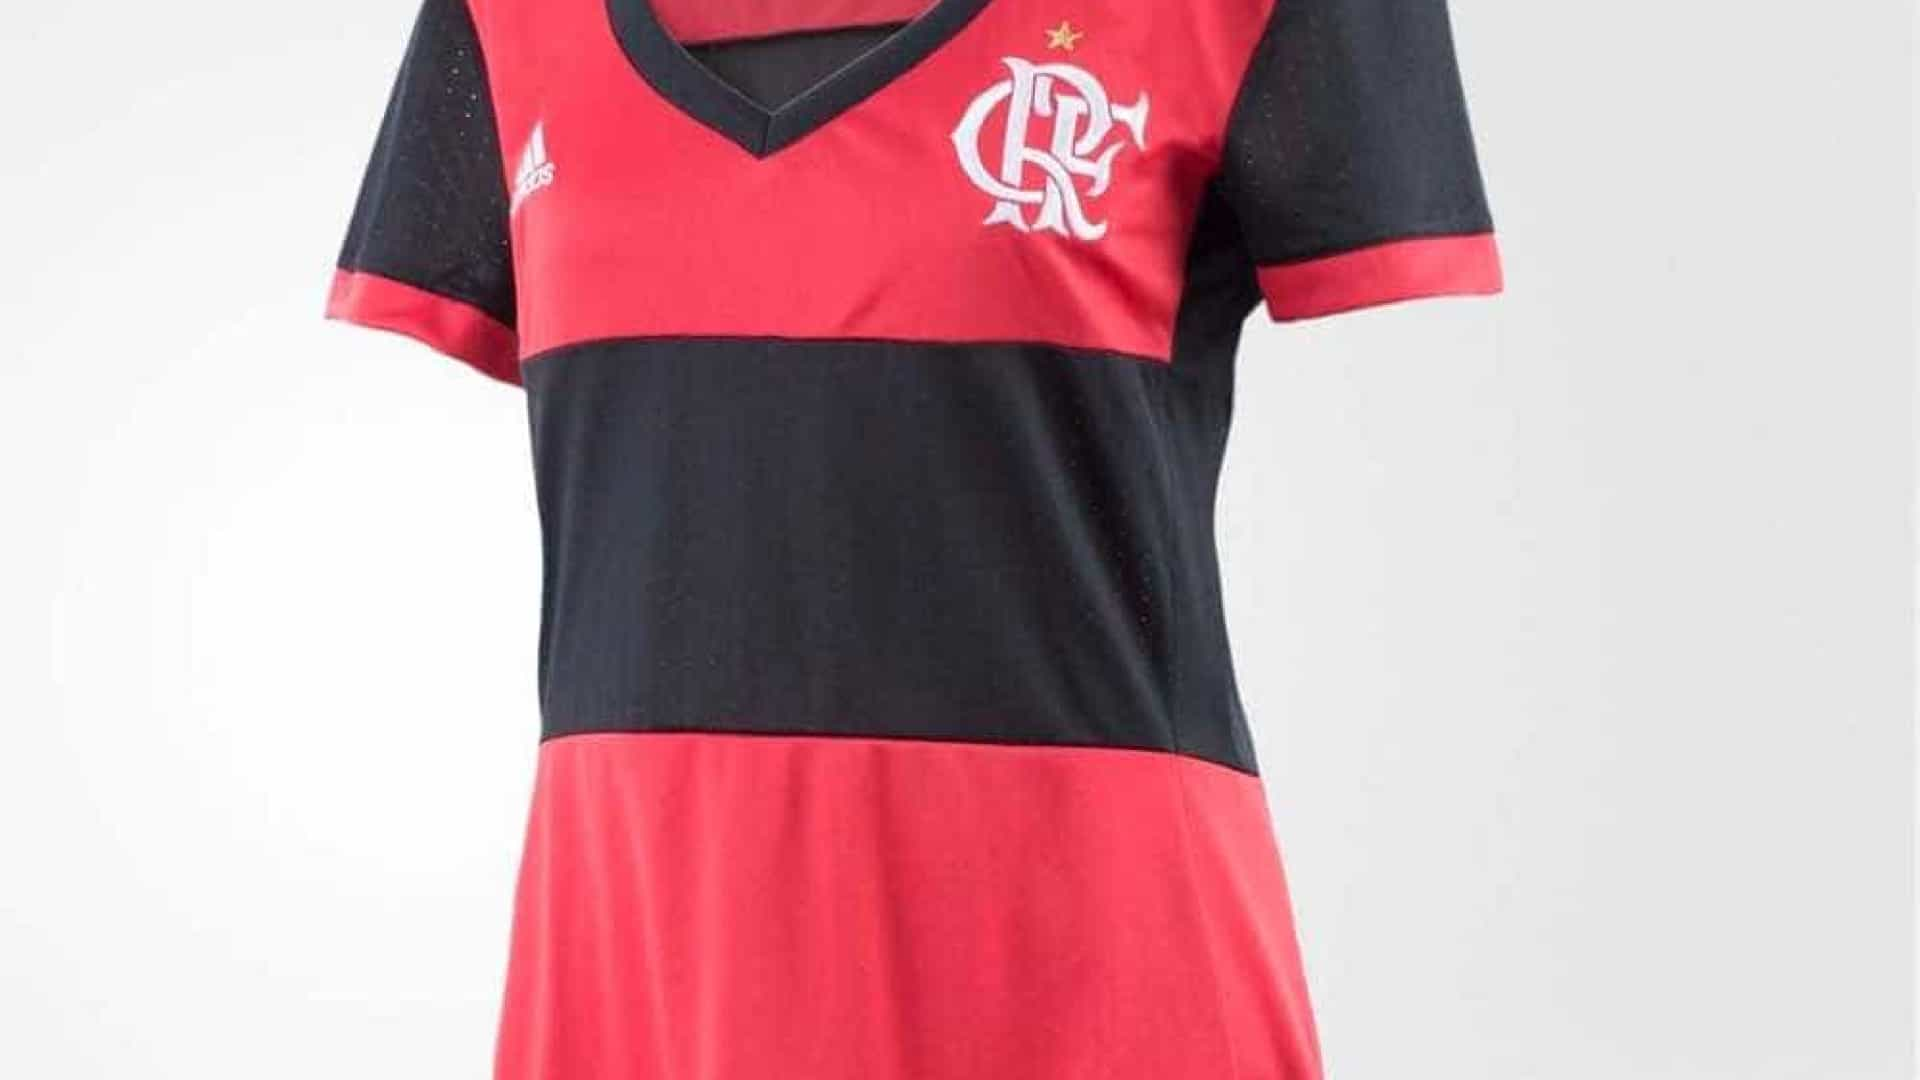 9fcc9a6025 Flamengo lança camisa feminina